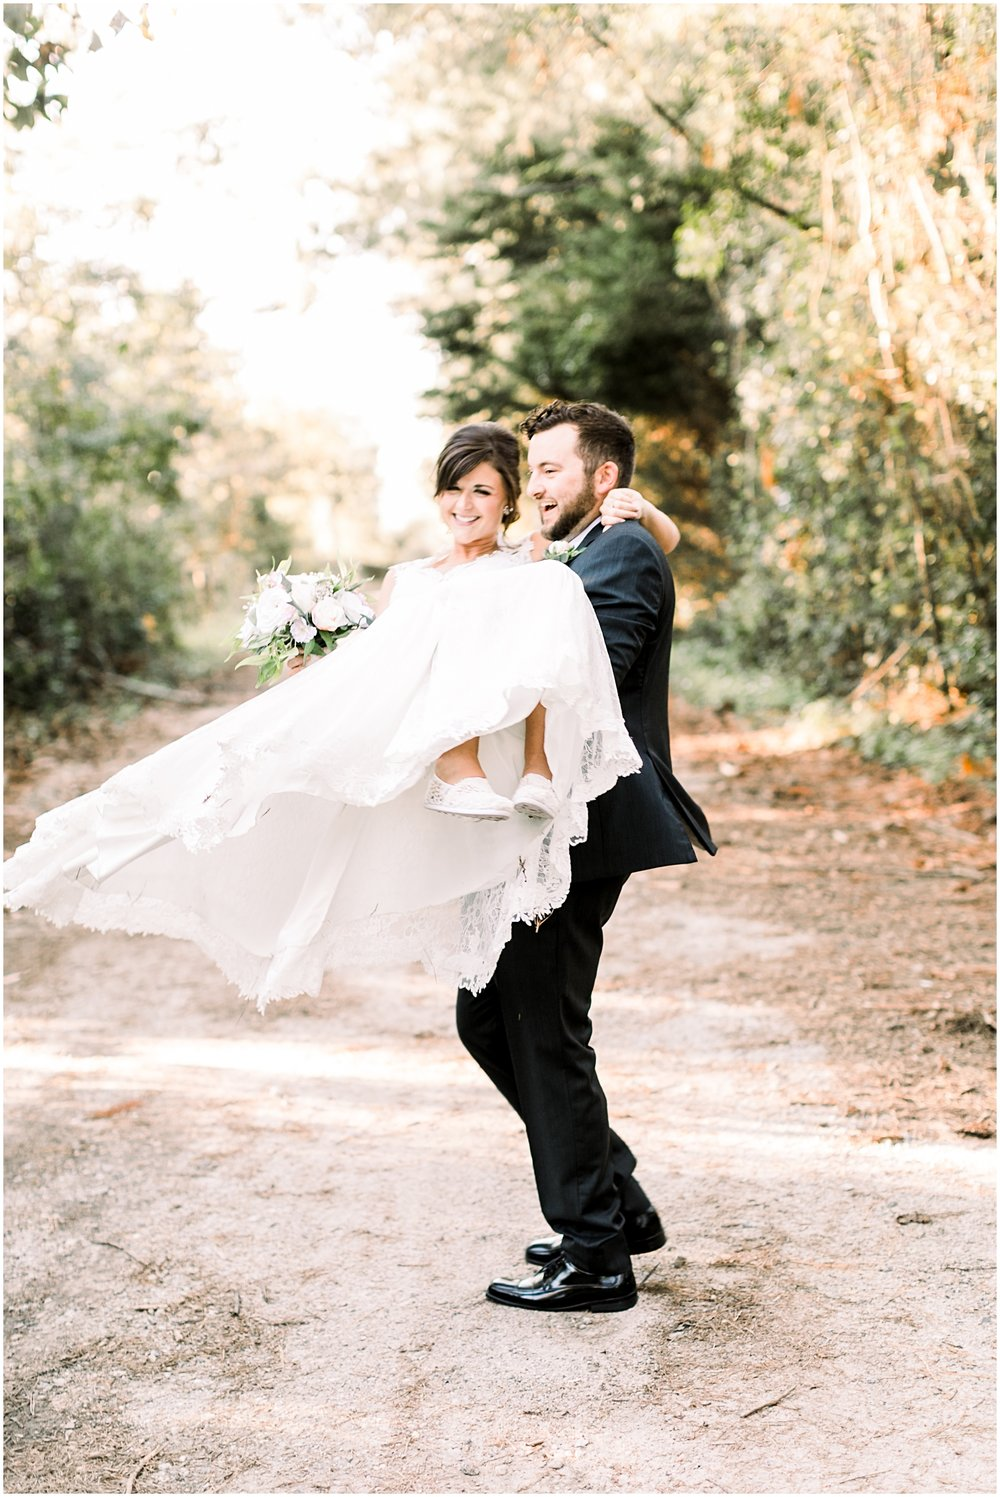 Wrightsville Manor Wedding Venue, Downtown Wilmington NC Wedding_Erin L. Taylor Photography_0031.jpg